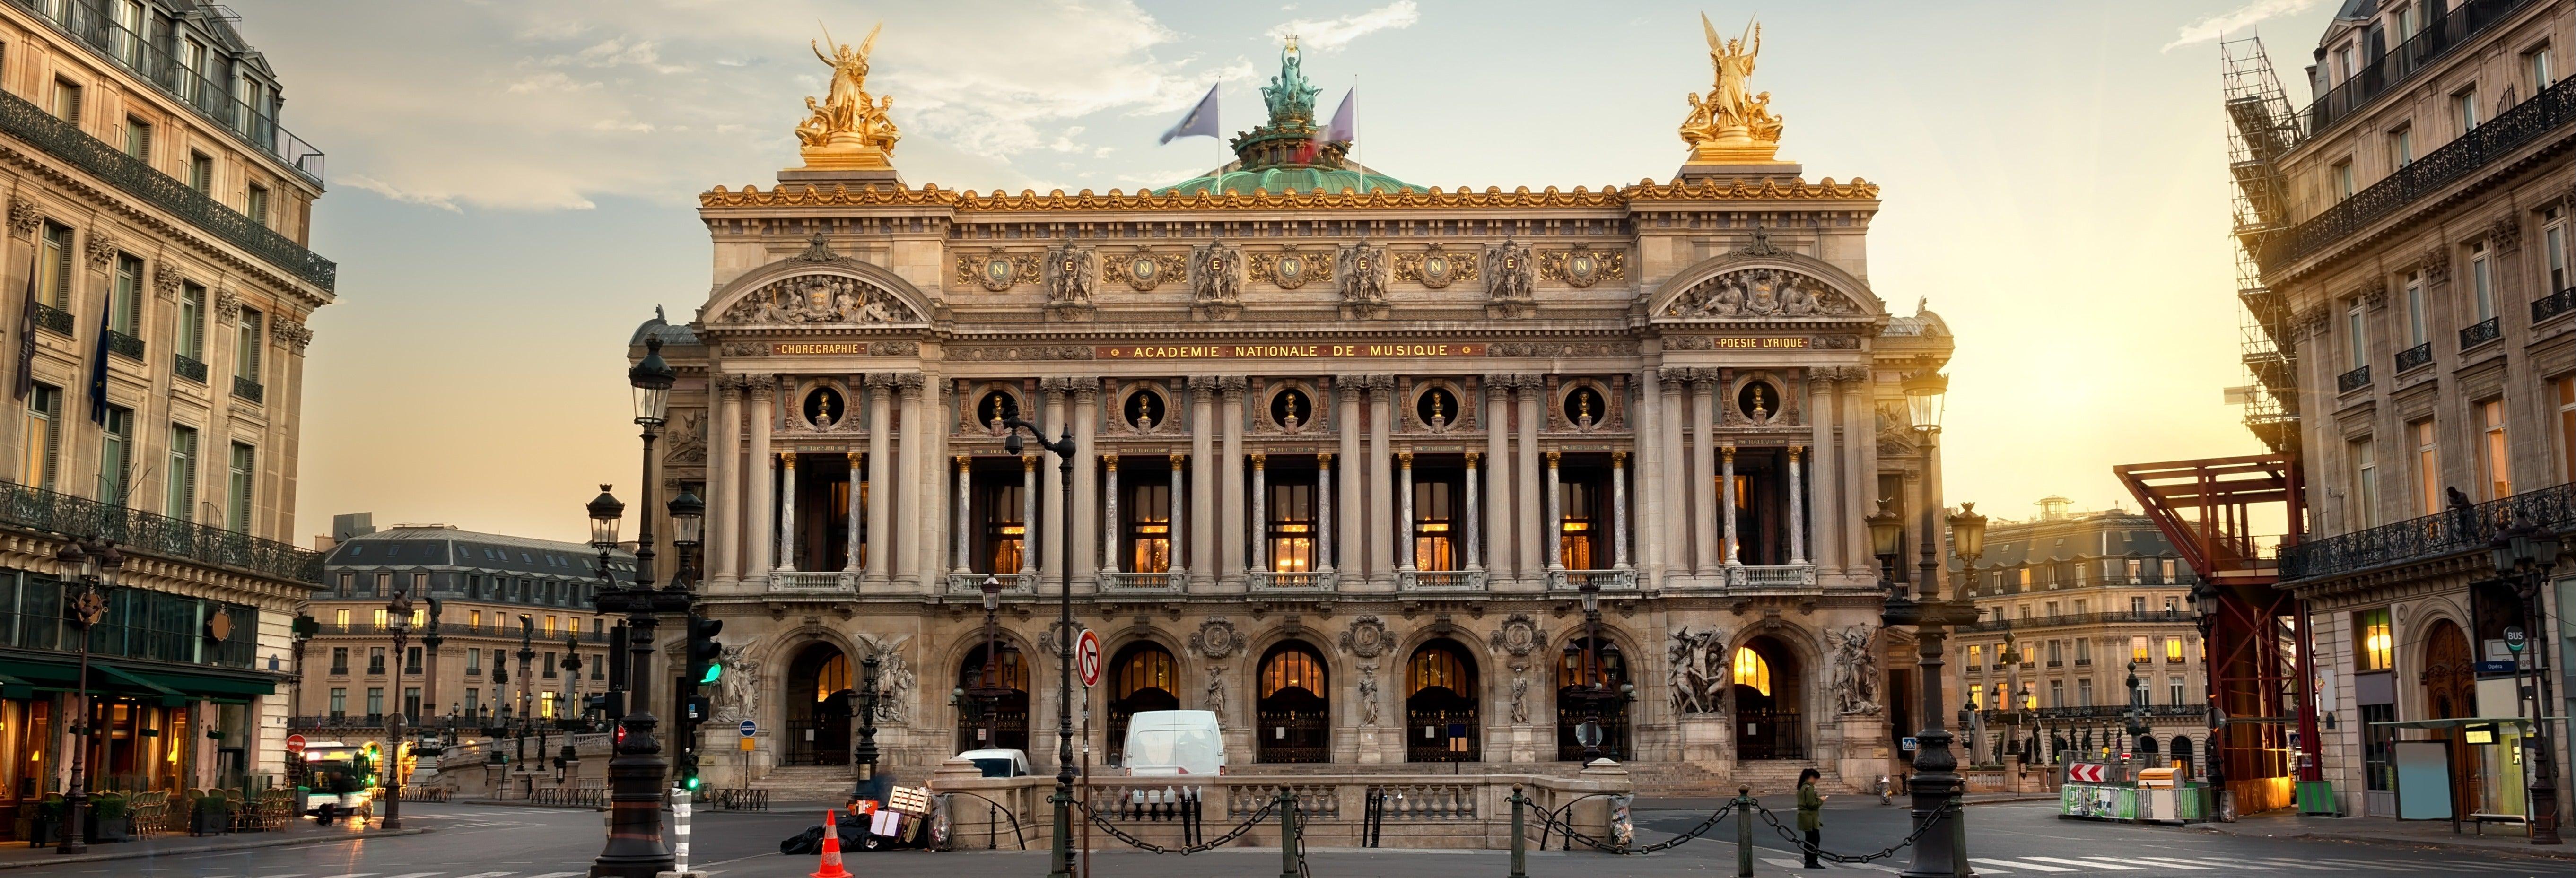 Visita guiada pela Ópera Garnier